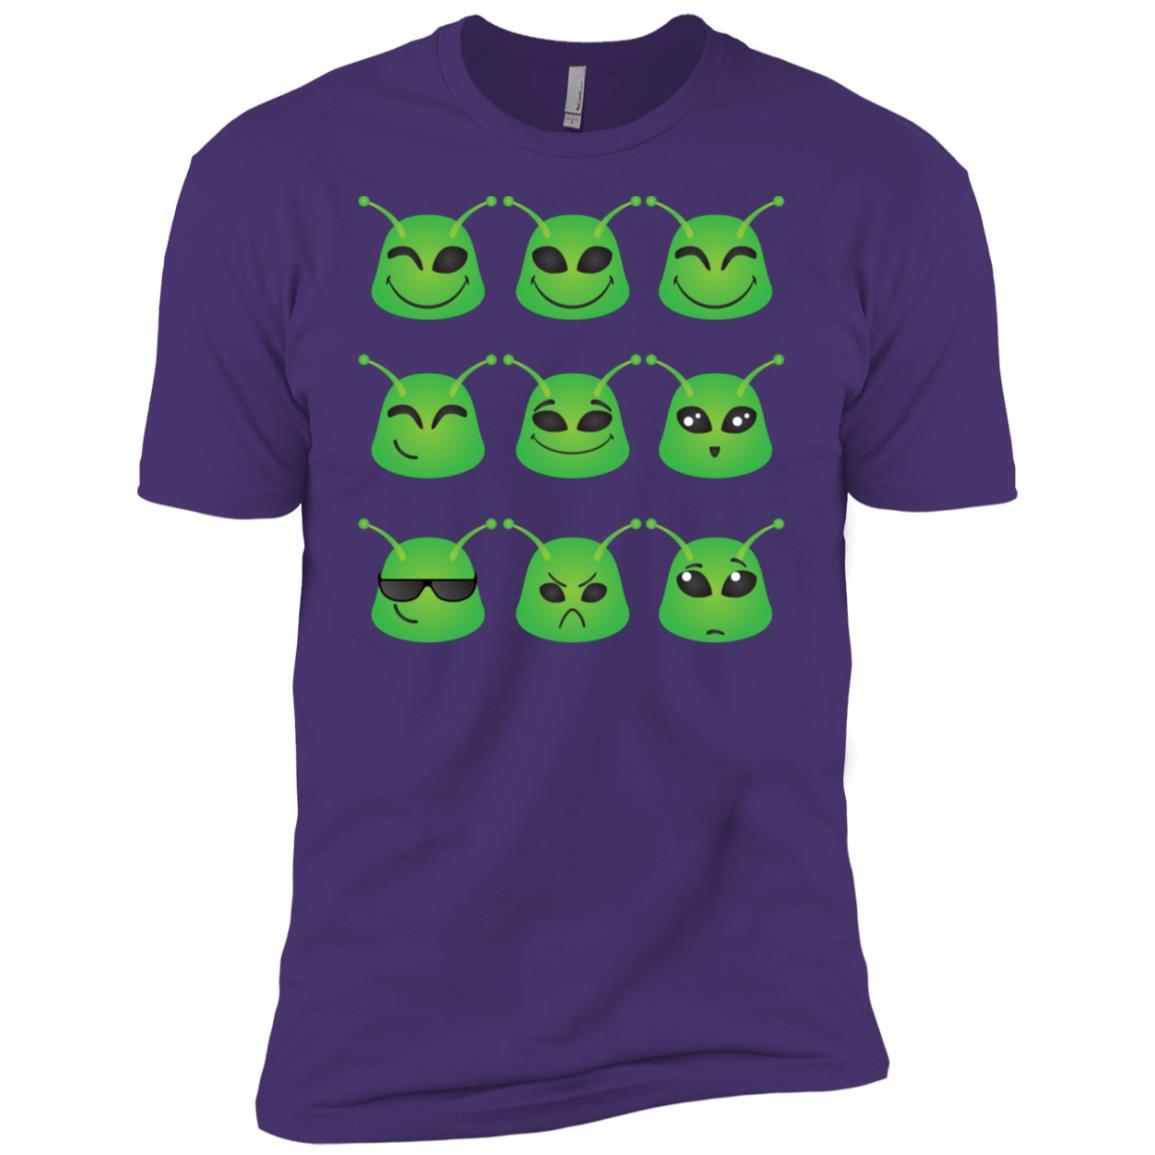 Cute Alien Smileys Gift For Alien Emojis Believers Men Short Sleeve T-Shirt